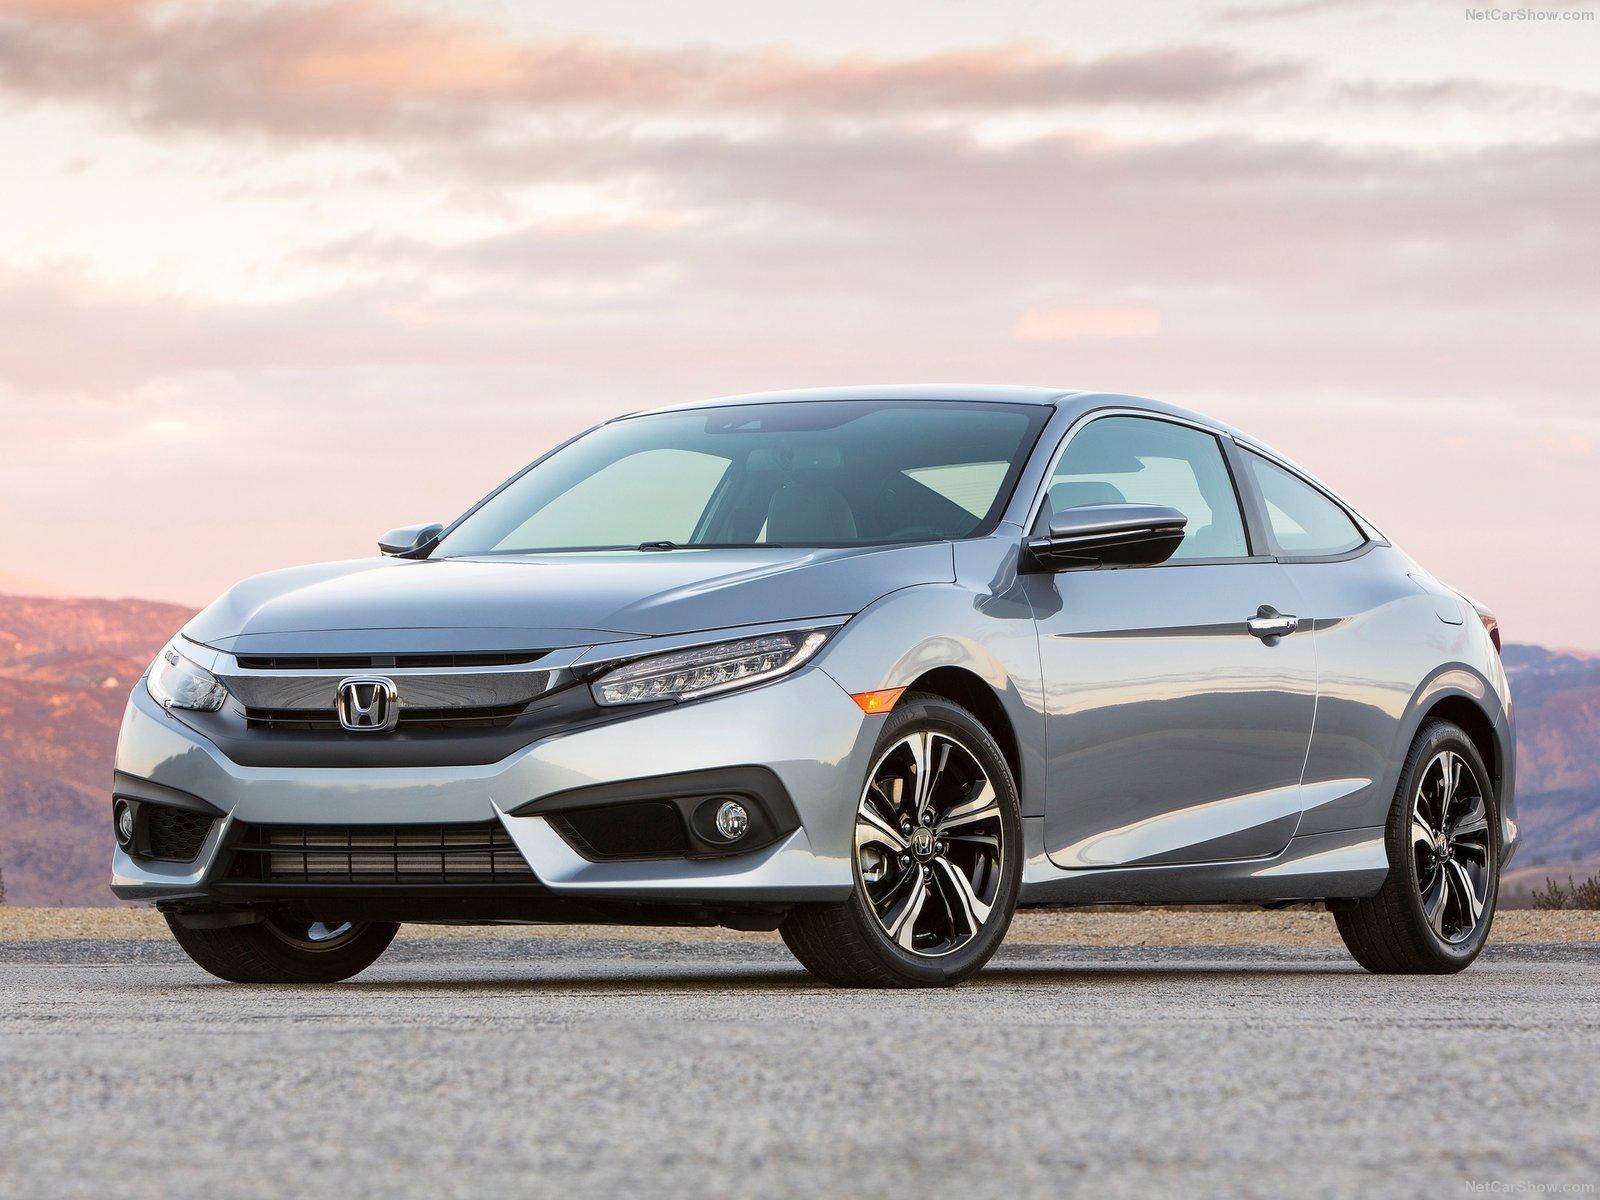 2016 honda civic cars silver coupe wallpaper 1600x1200 for Honda owner login